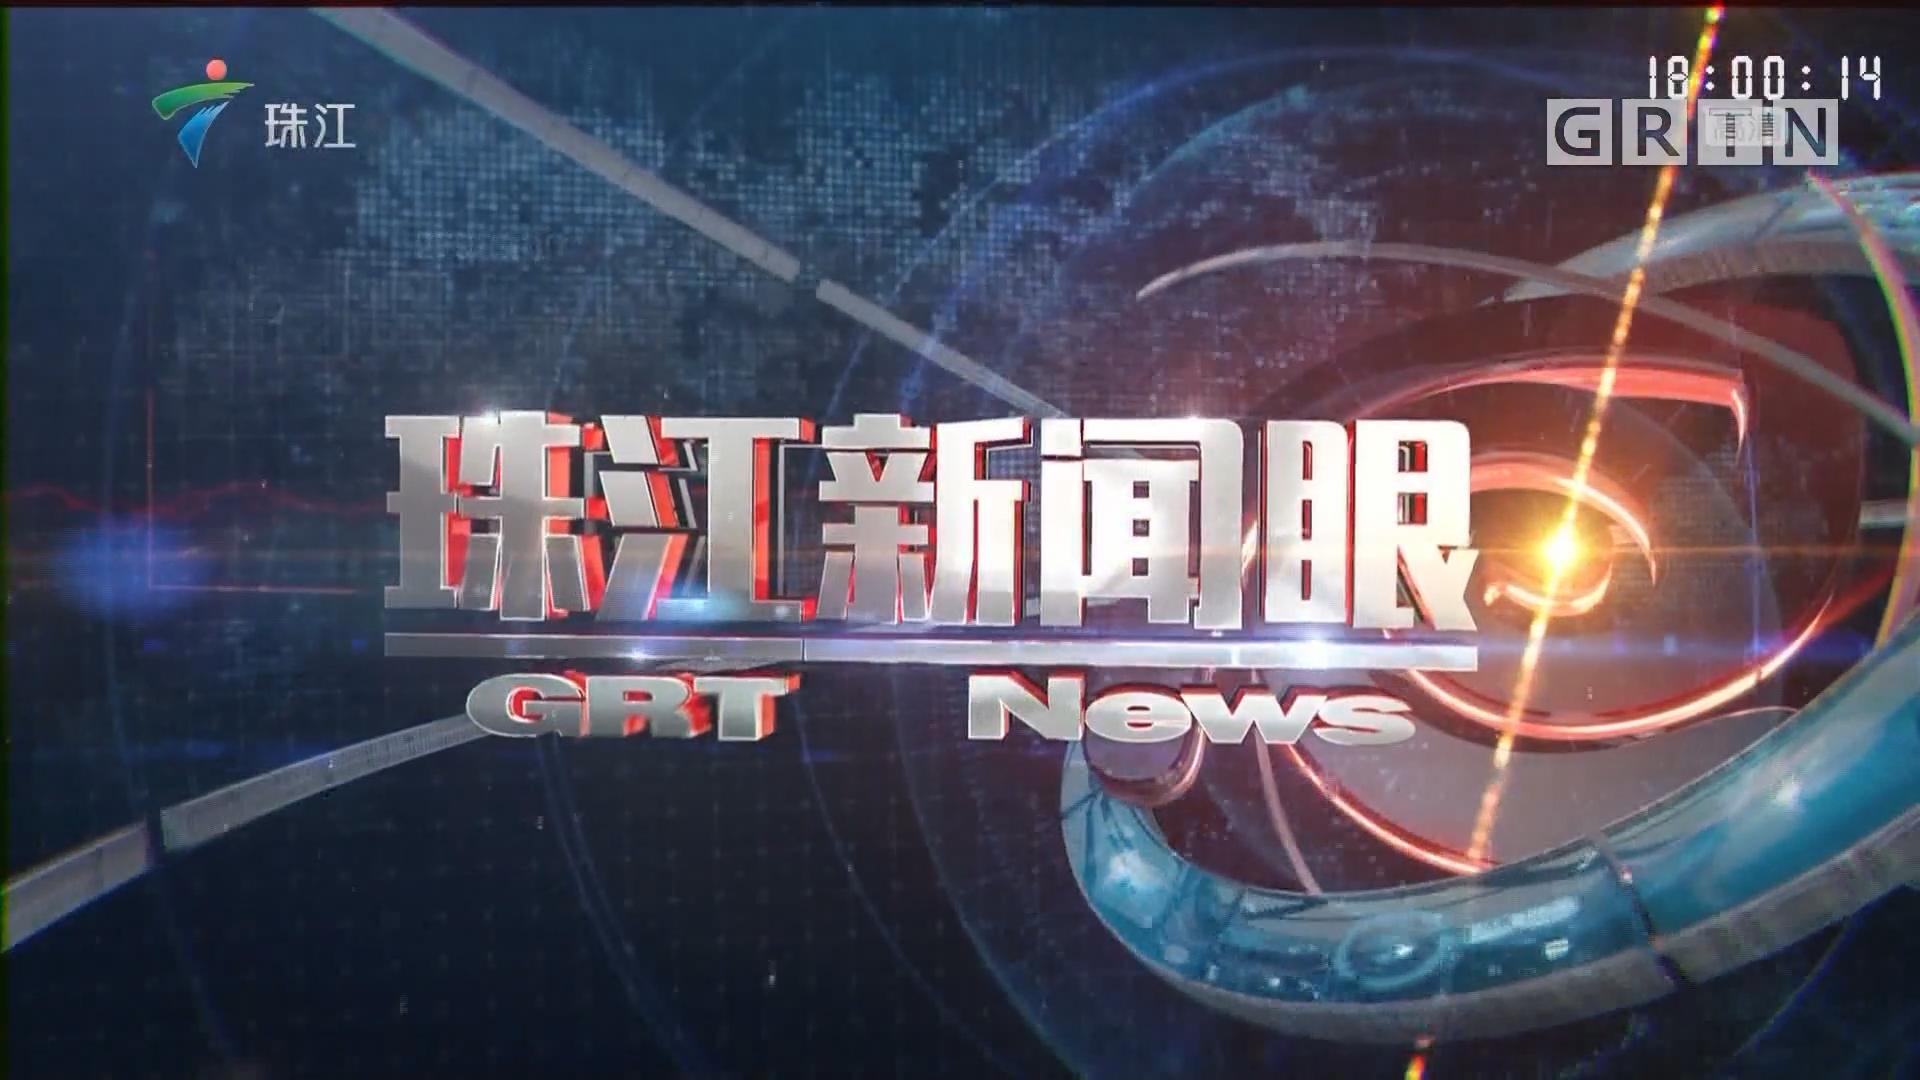 [HD][2019-02-04]珠江新闻眼:灯火花海添喜庆 南粤处处迎新春